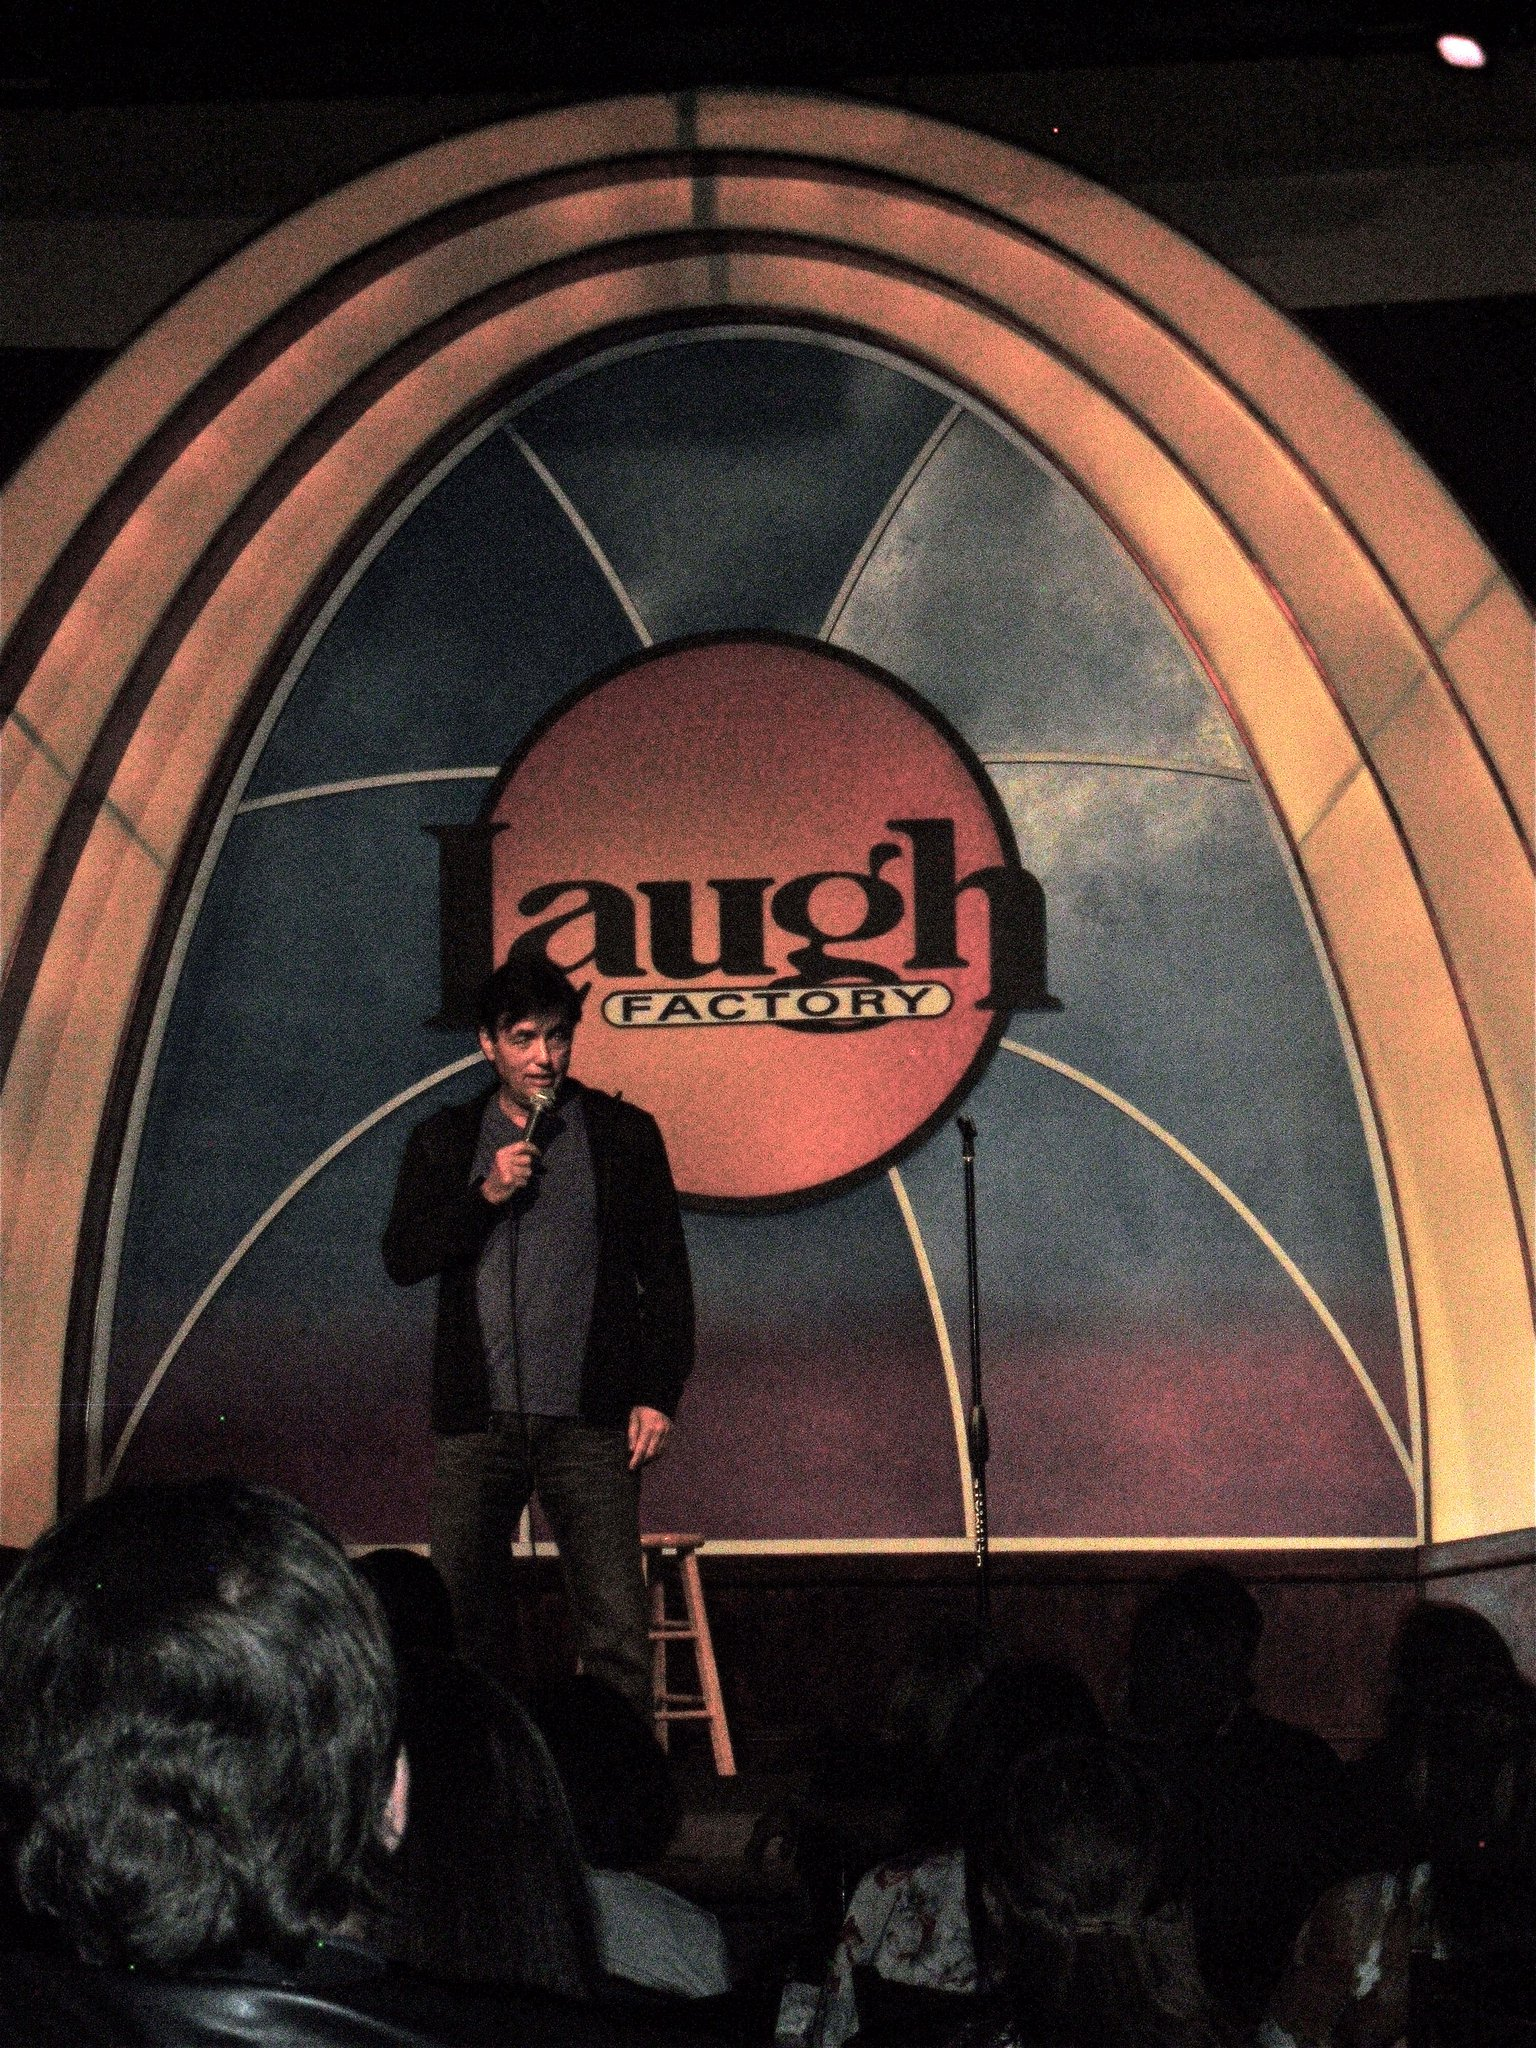 Long Beach Laugh Factory